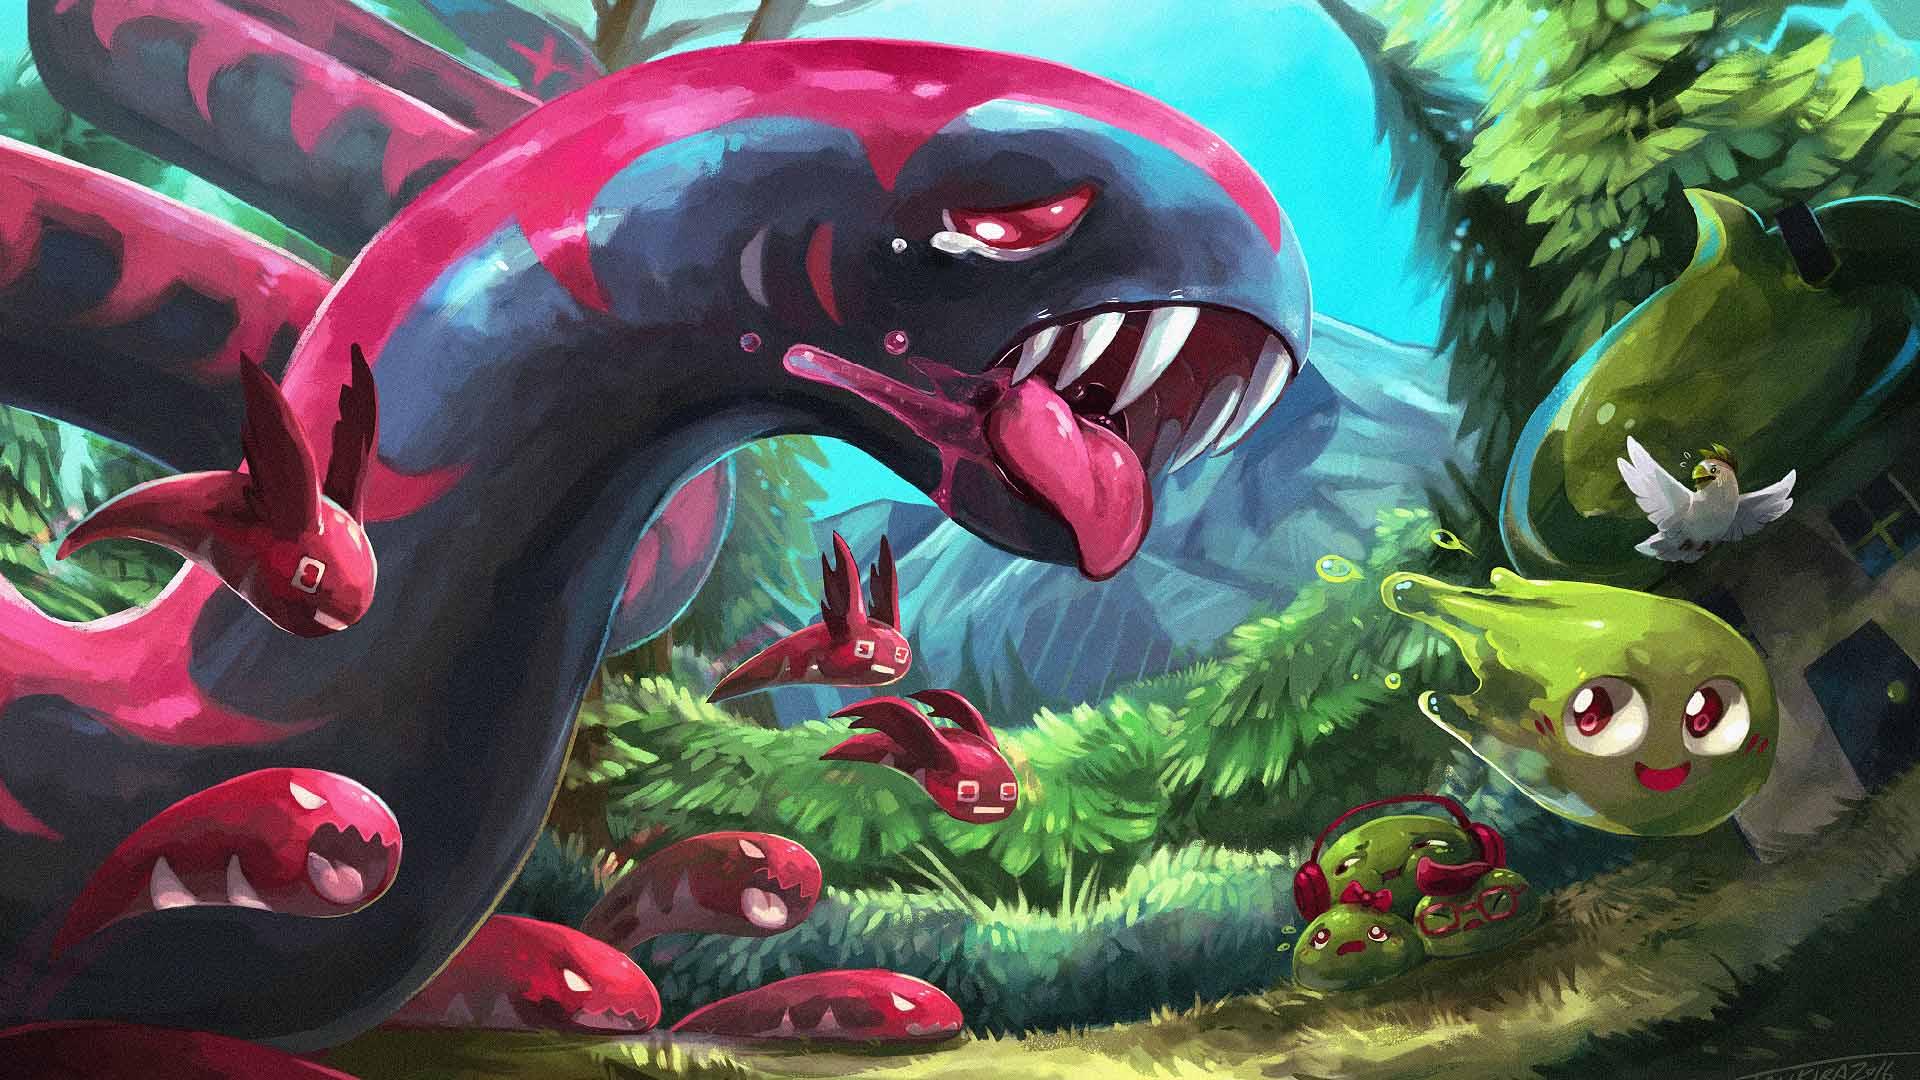 Tentacle Monster Slime Image Folder Dump